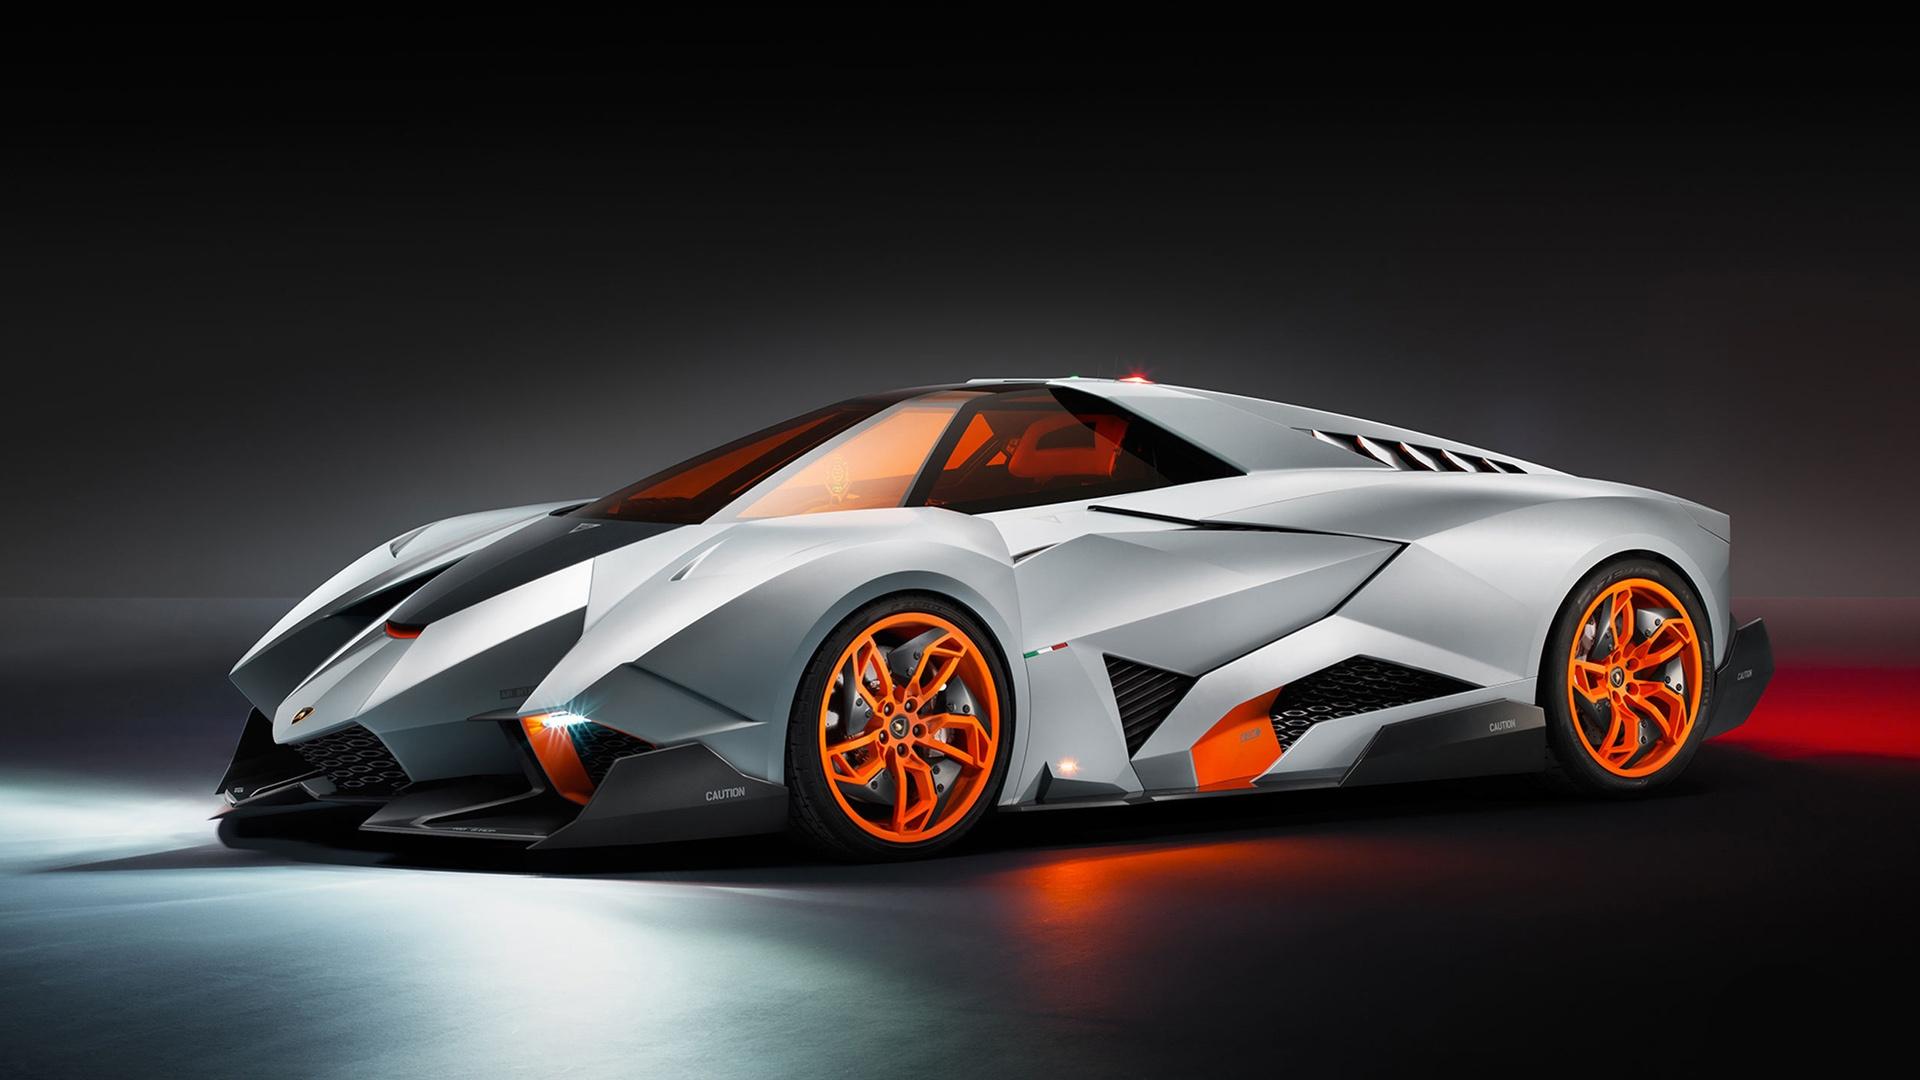 Lamborghini Egoista Concept Car Wallpapers | HD Wallpapers